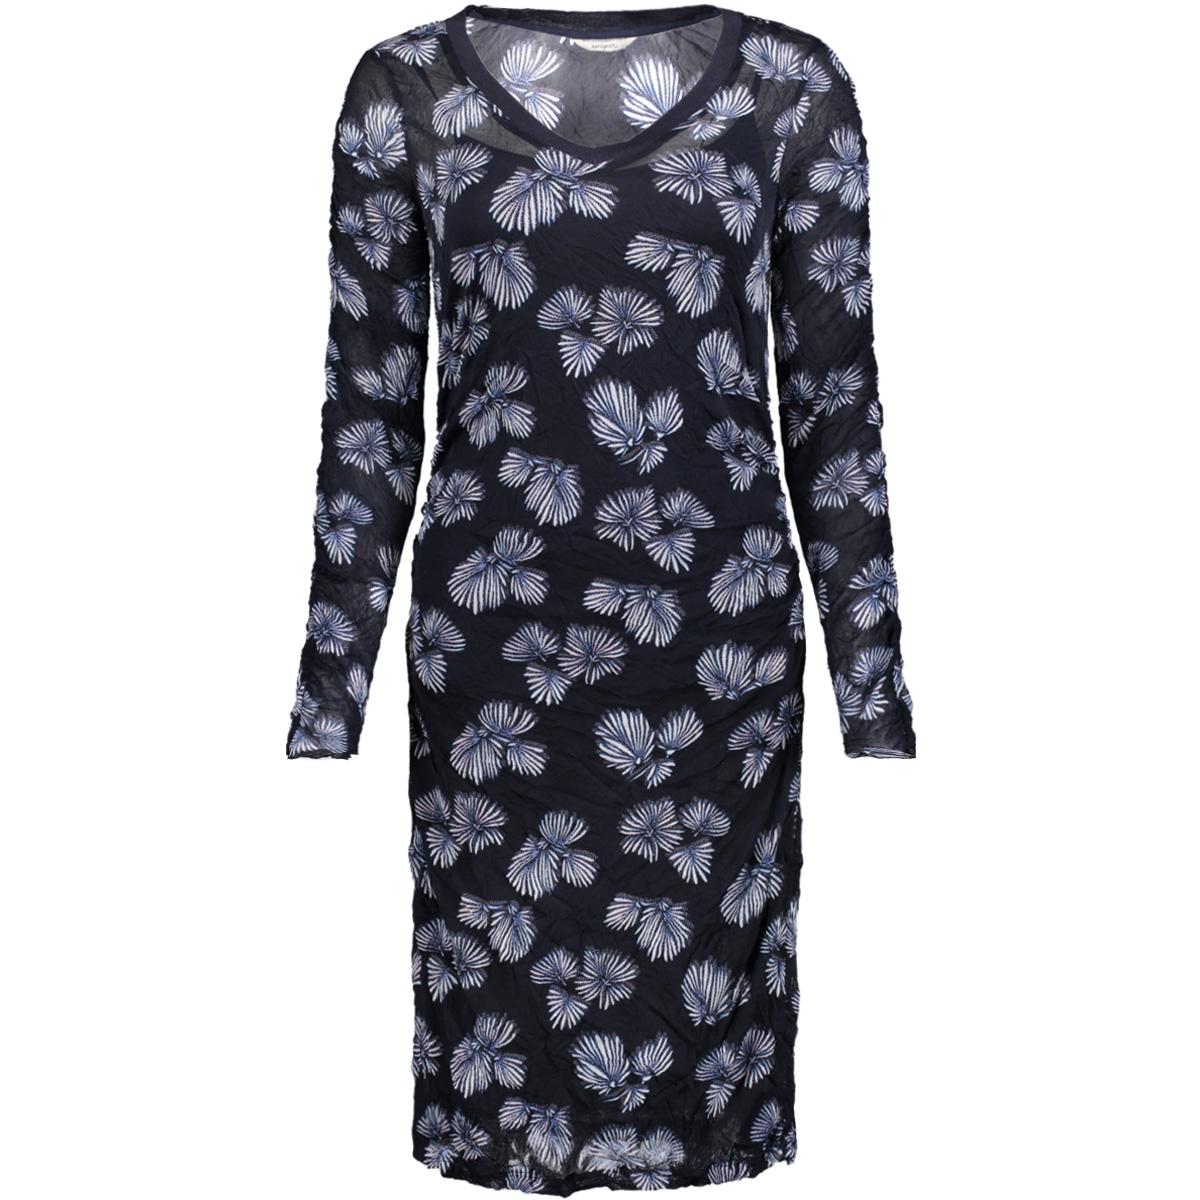 jurk met print 23001448 sandwich jurk 41045